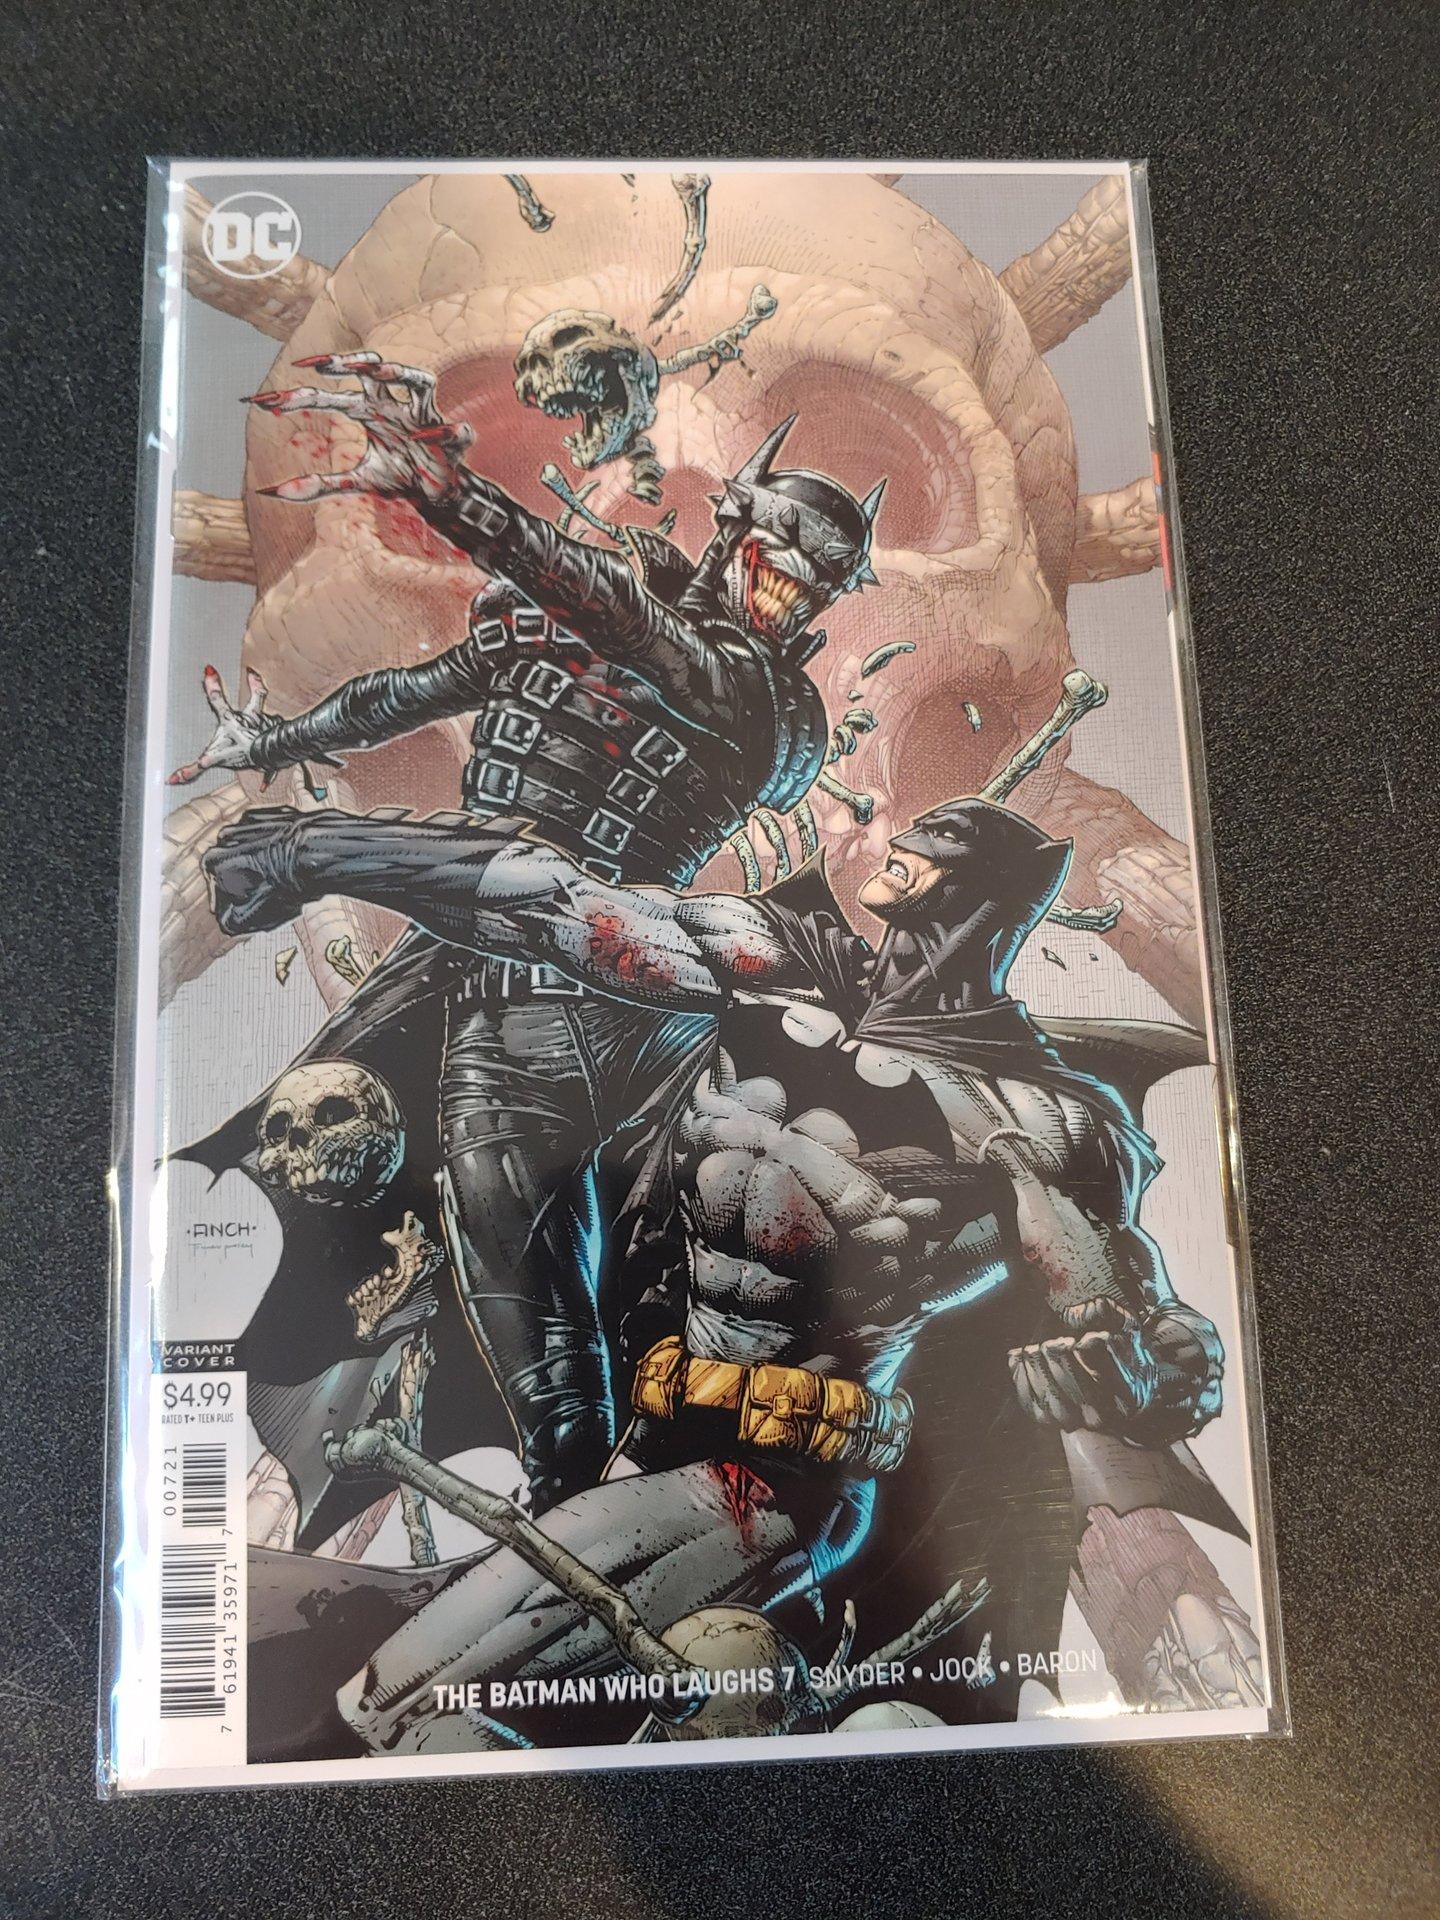 BATMAN THE BATMAN WHO LAUGHS #7 DAVID FINCH VARIANT COVER NM!